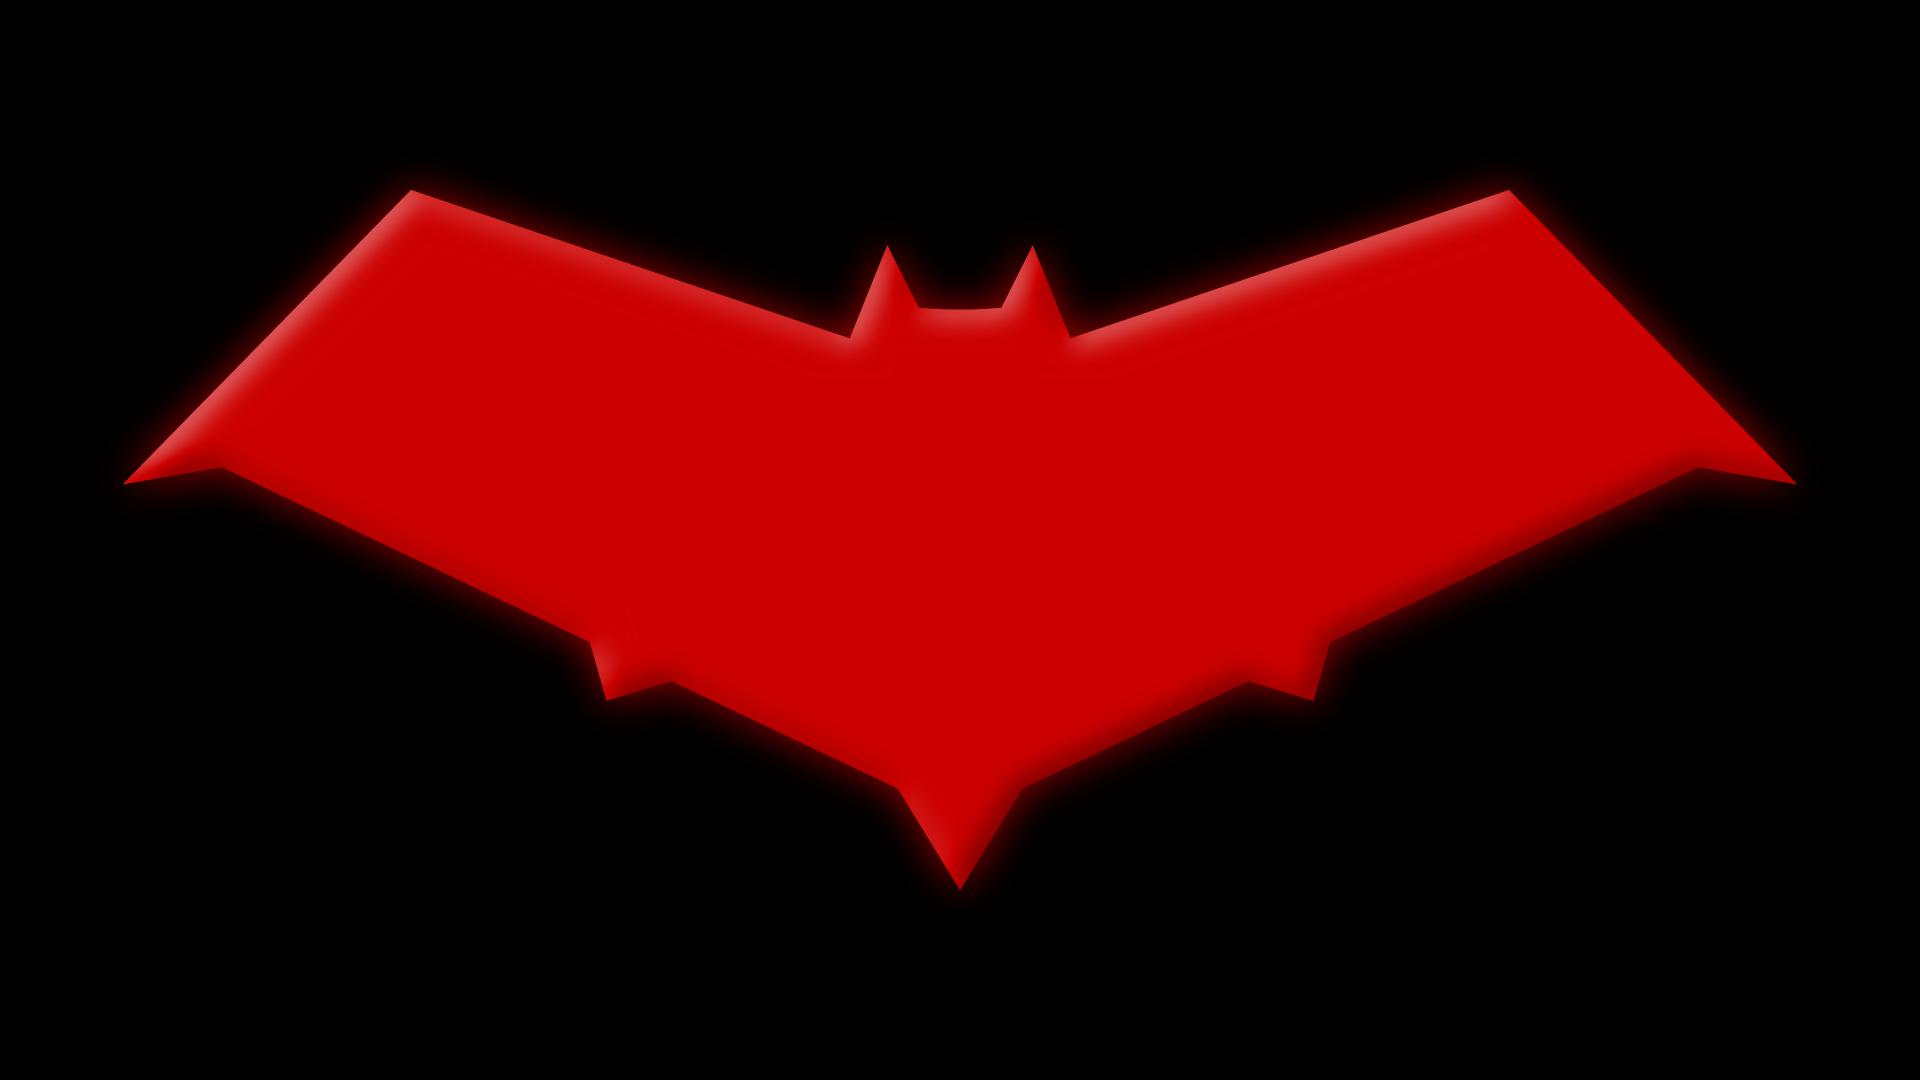 red hood symbol by yurtigo on deviantart